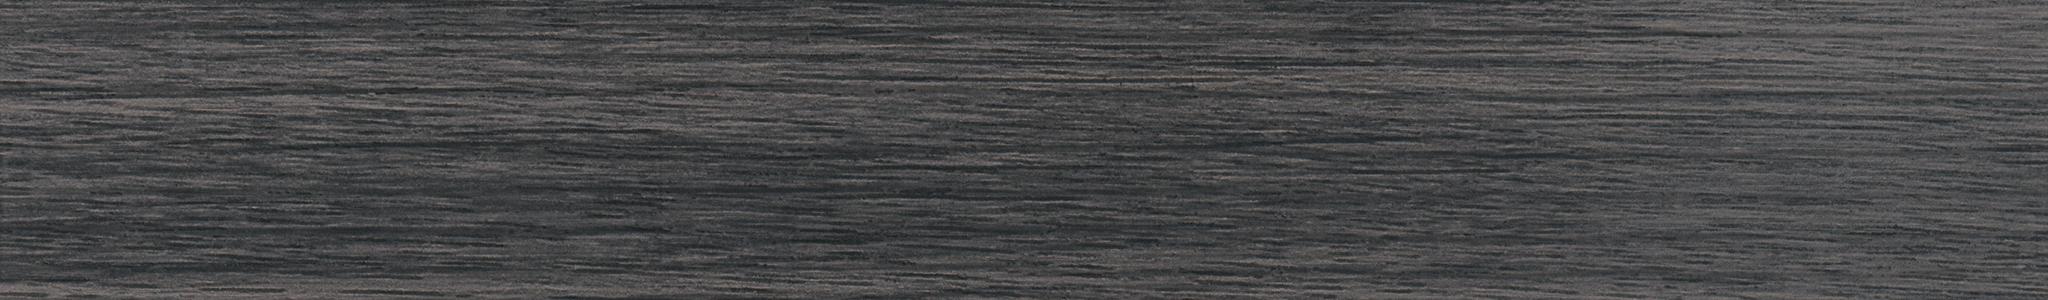 HD 251702 ABS hrana jilm hnědý gravír